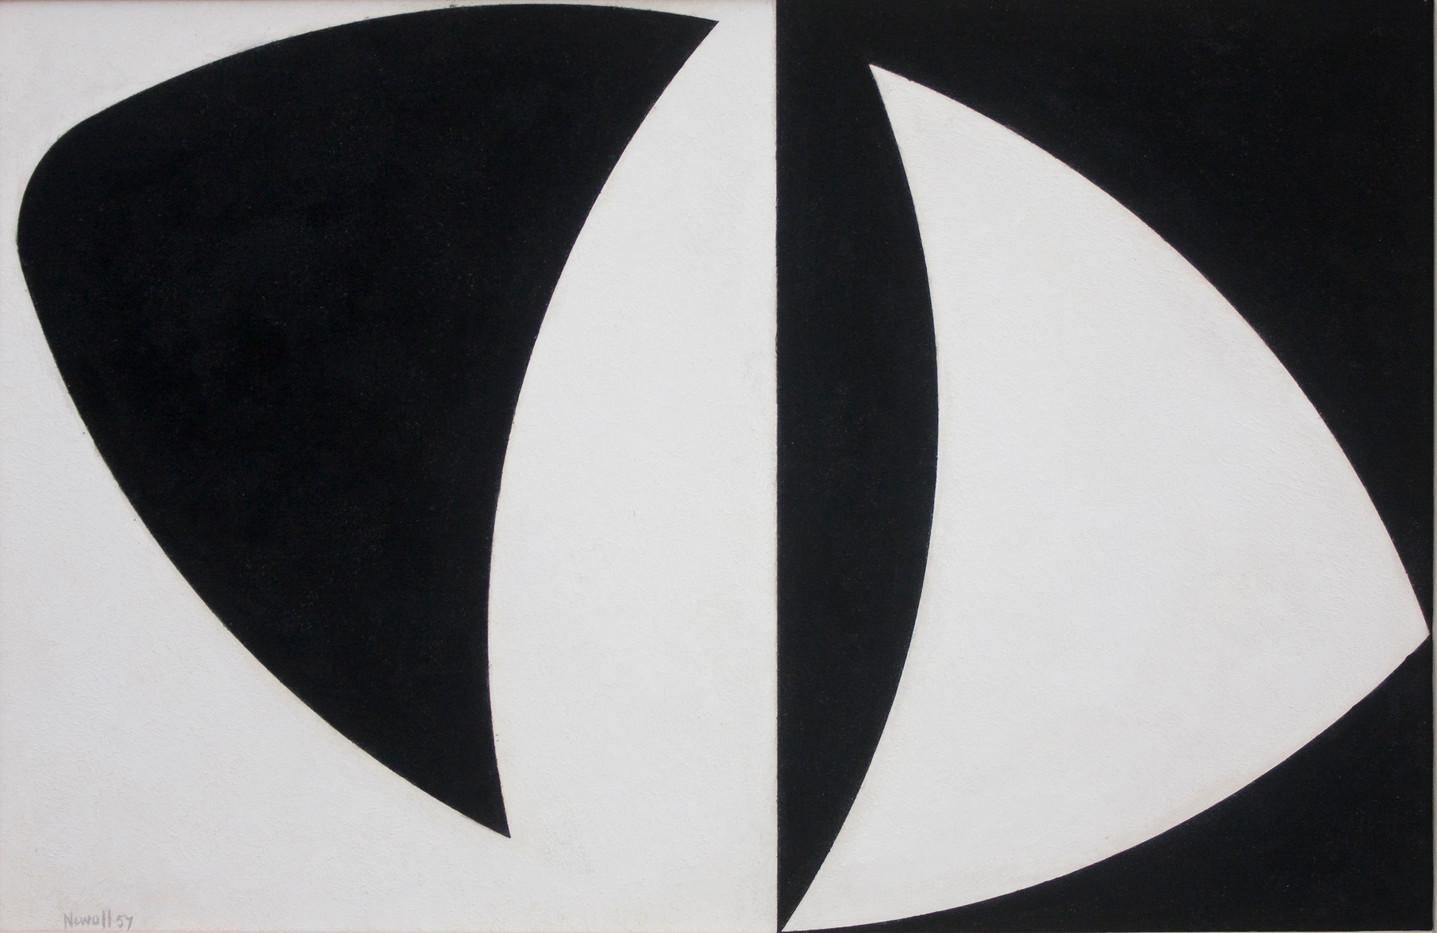 Albert Newall   Untitled   1957   Mixed Media on Board   29 x 44 cm